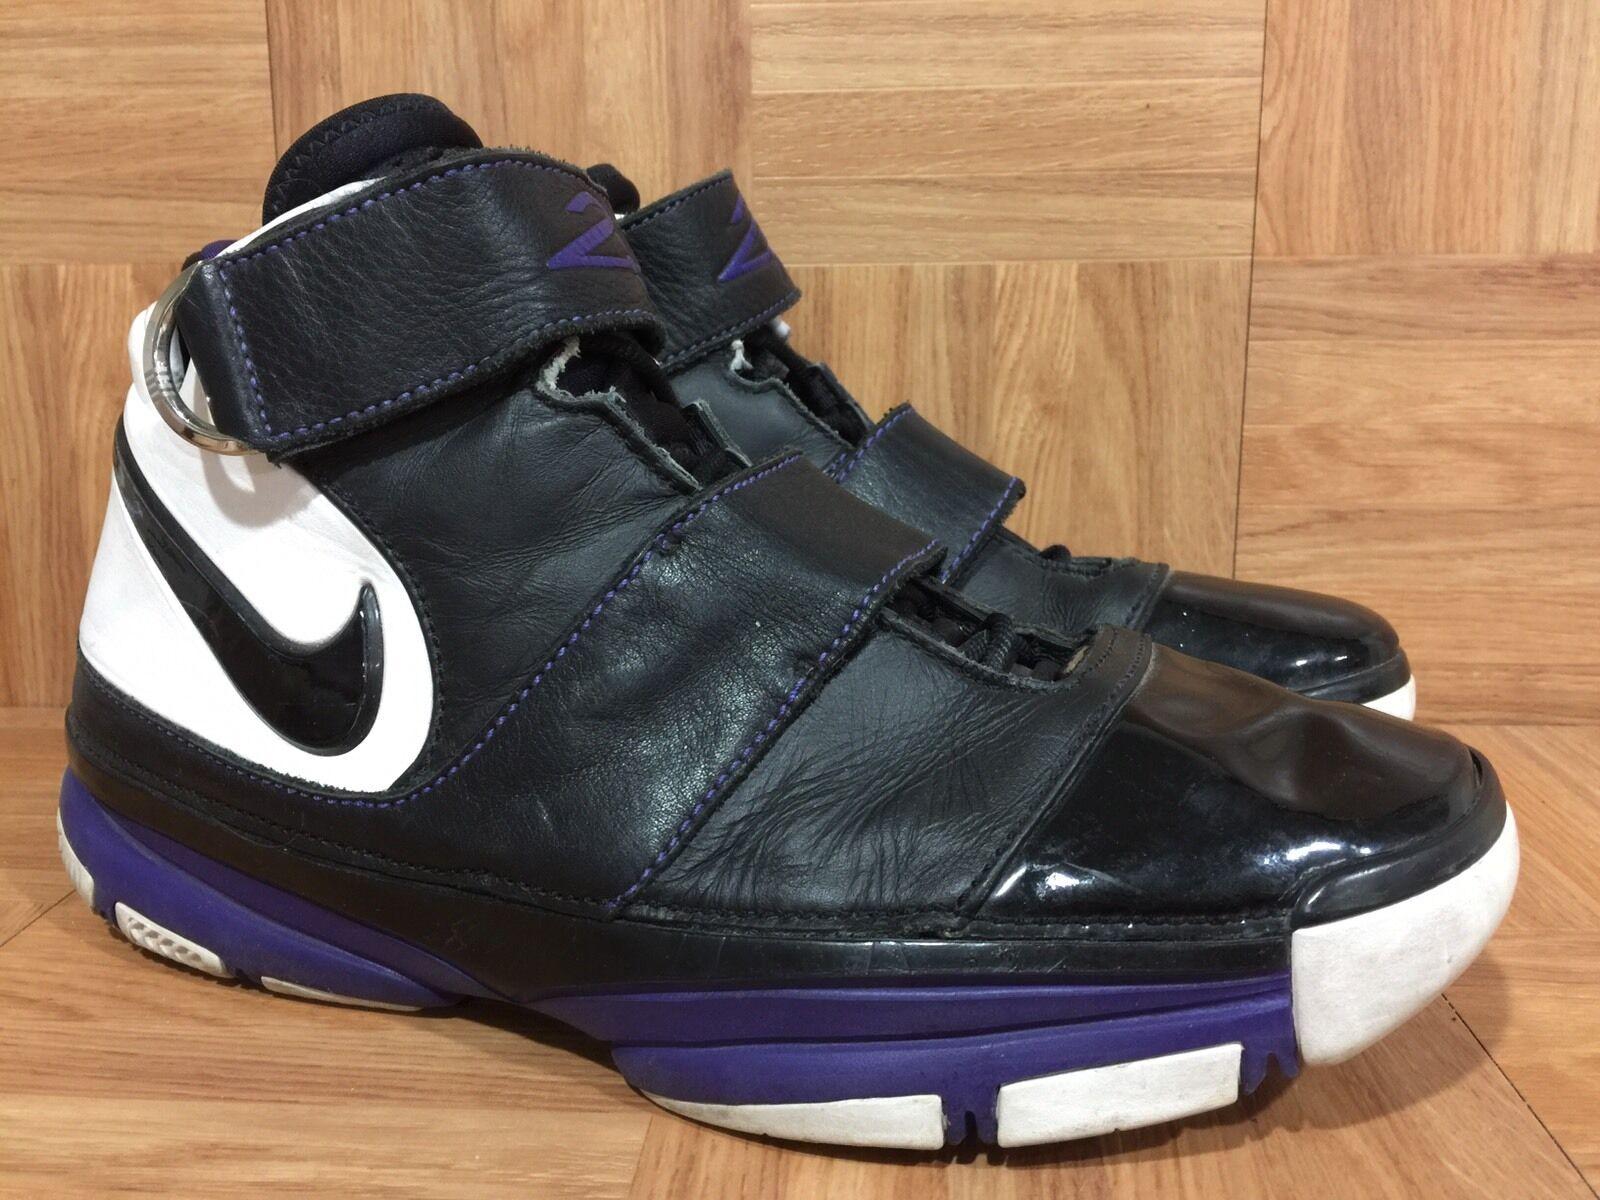 RARE  Nike Kobe 2 II Strength ST ORCA Patent Black Purple White 316835-001 S 11